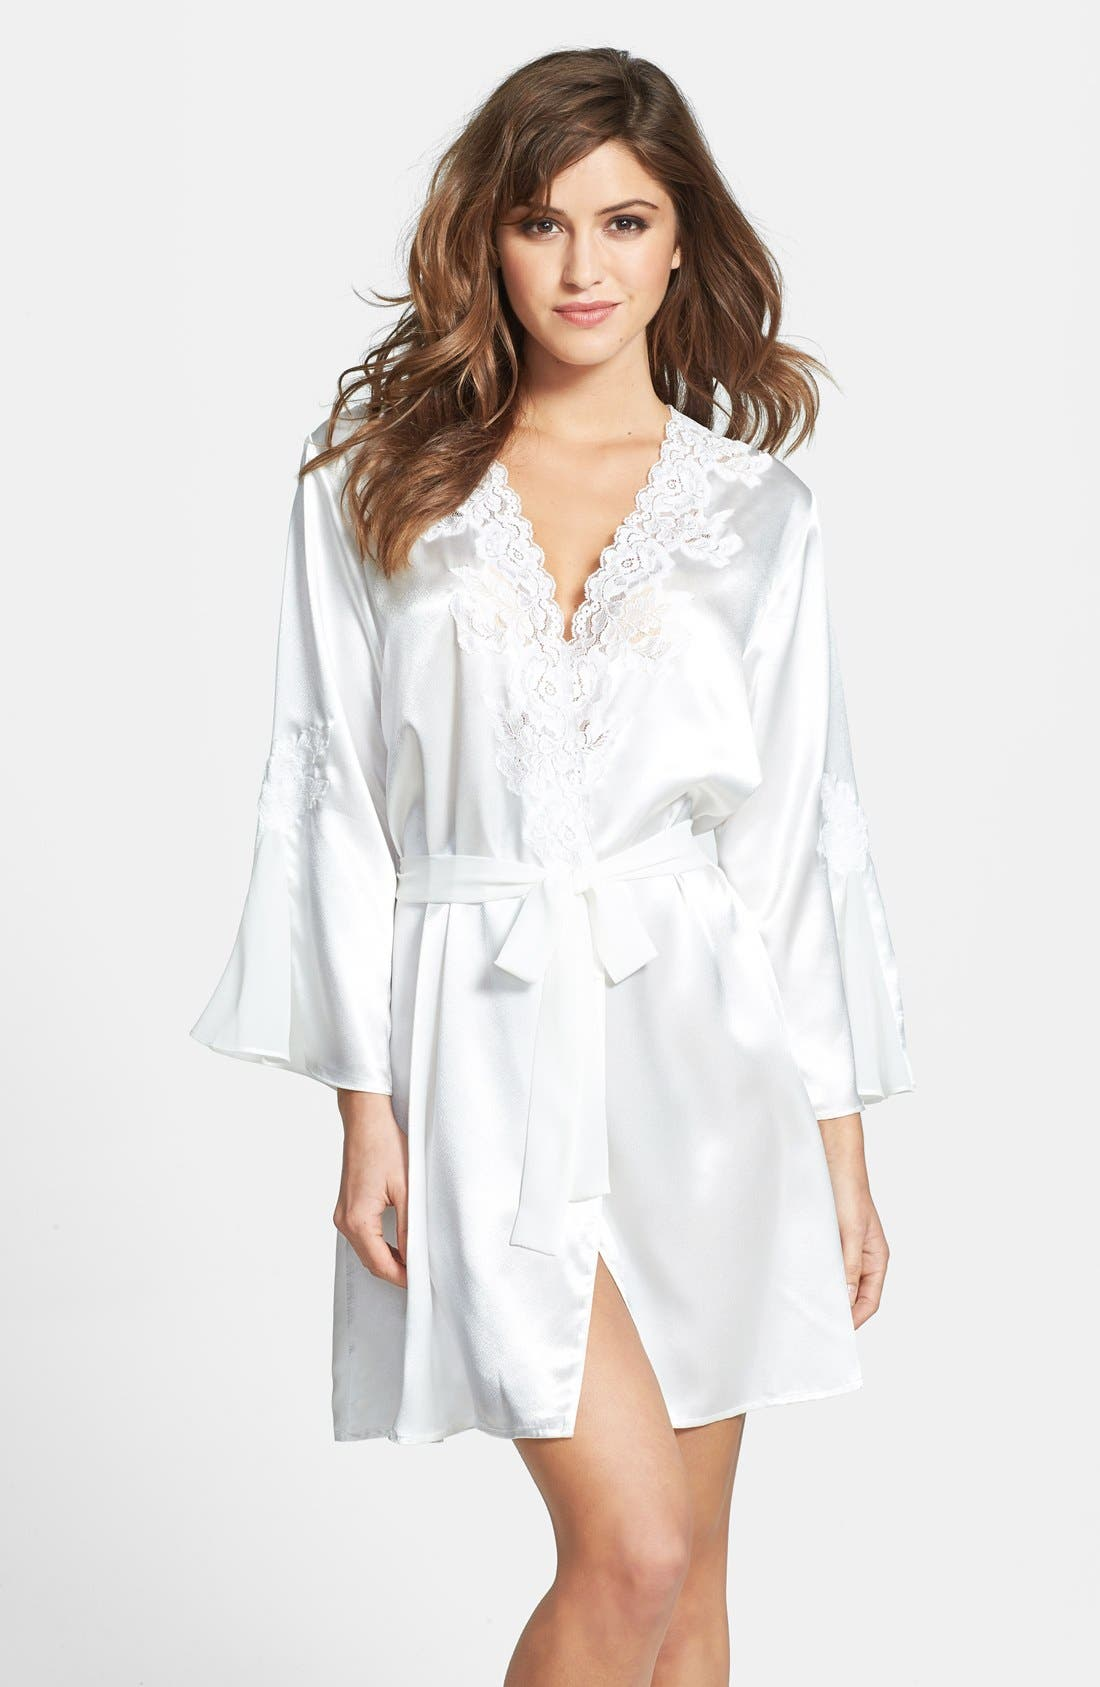 Alternate Image 1 Selected - Oscar de la Renta Sleepwear 'Evening Bliss' Satin Charmeuse Wrap Robe